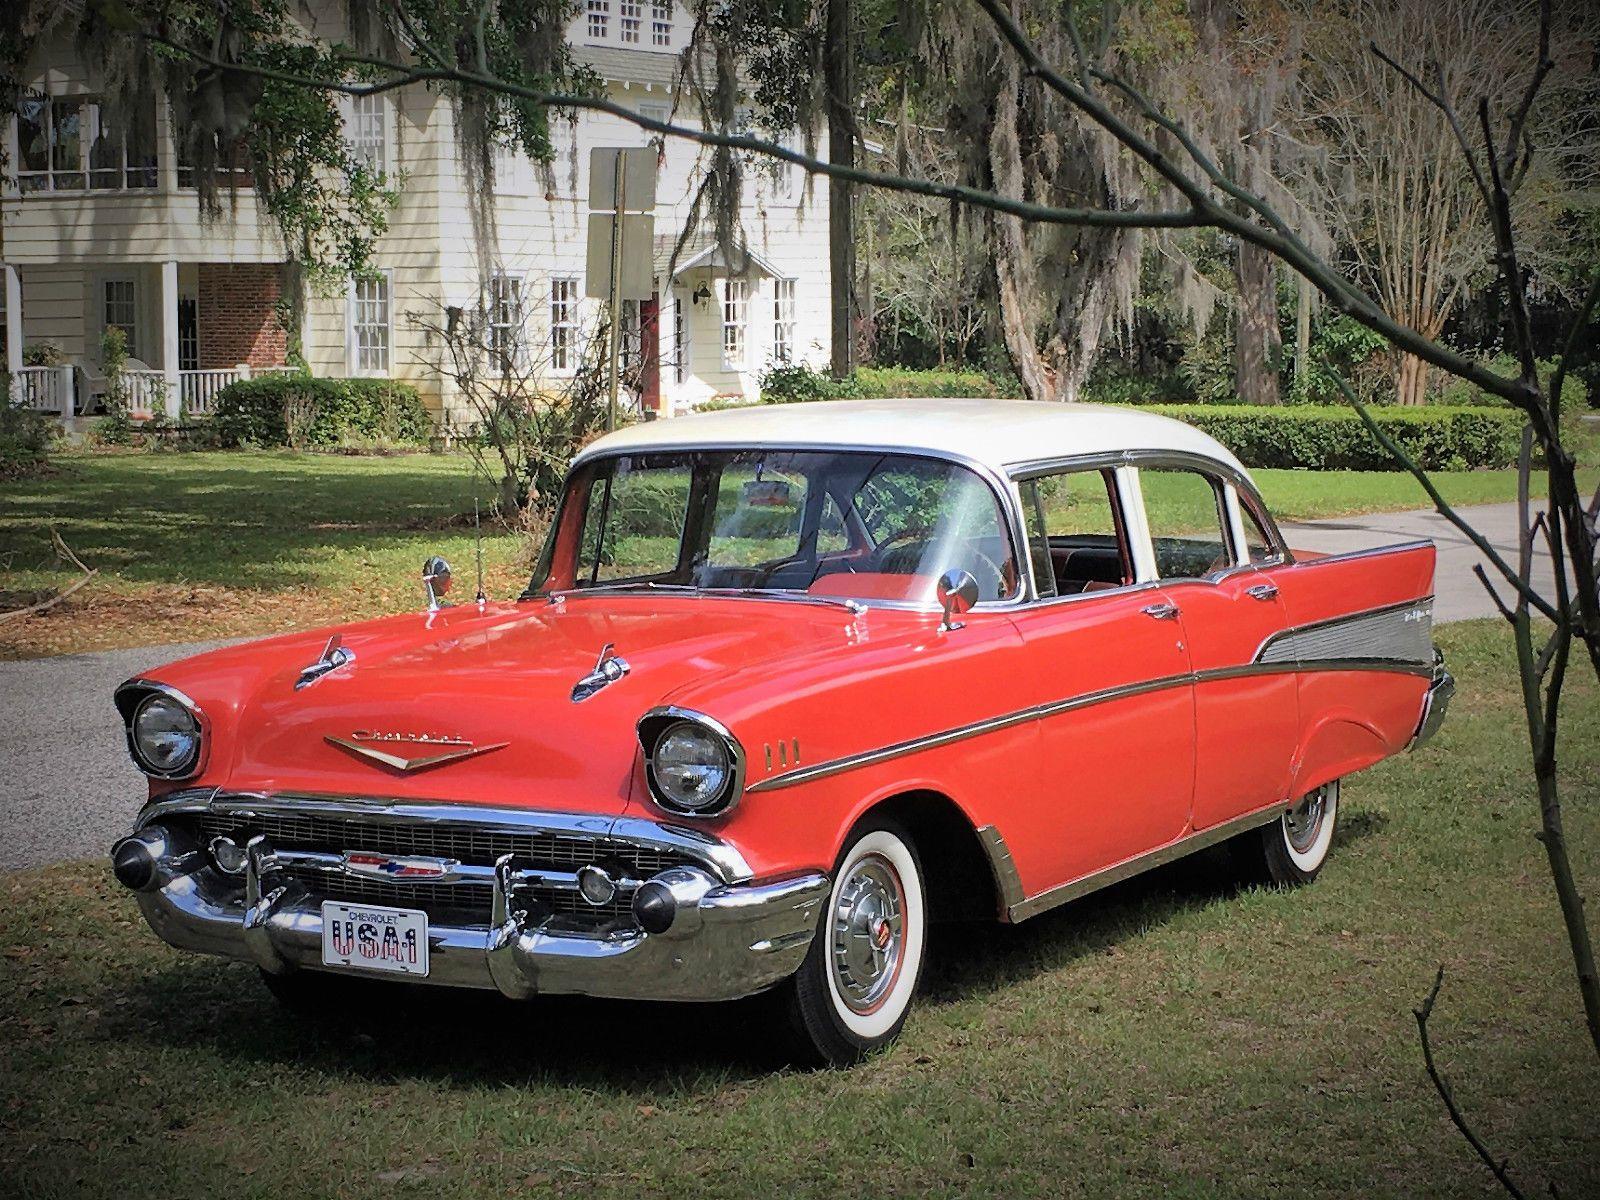 1957 Chevrolet Bel Air 150 210 4 Door Sedan Ebay Motors Cars